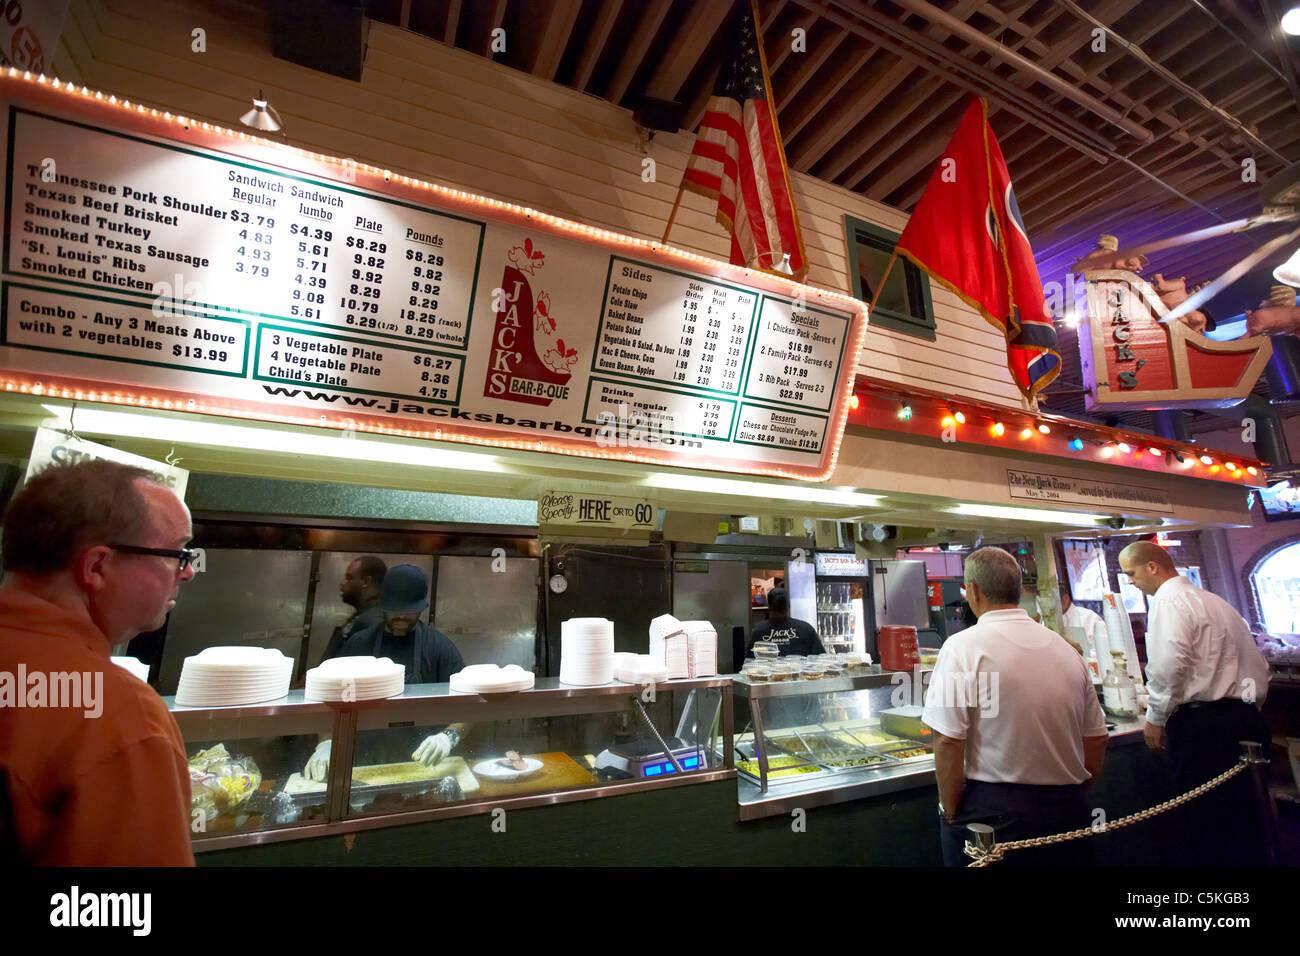 customers queue up at jacks bar-b-que nashville tennessee usa - Stock Image